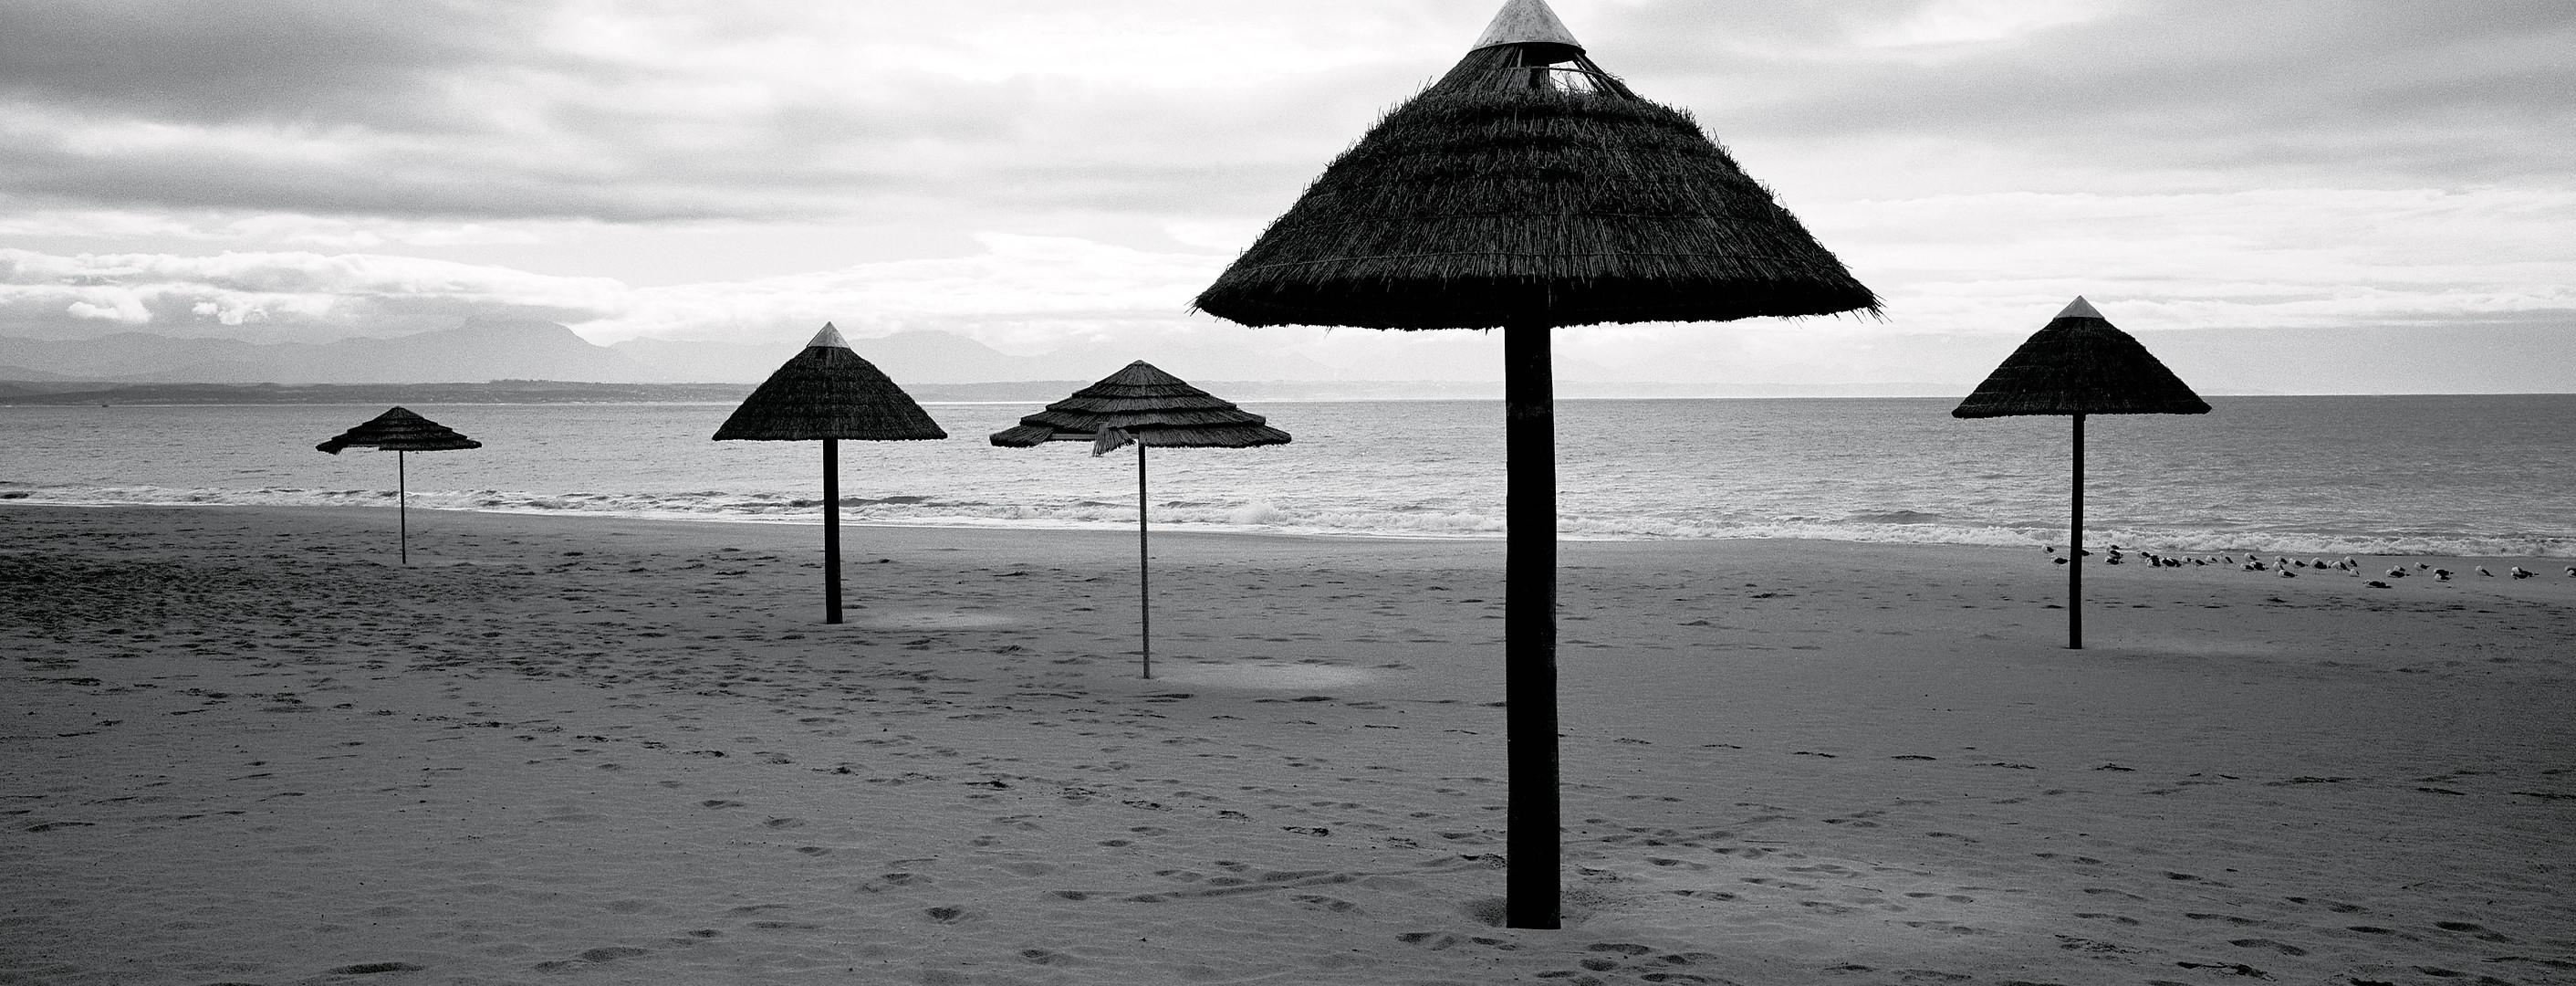 Southern Africa Portfolio-5.jpg